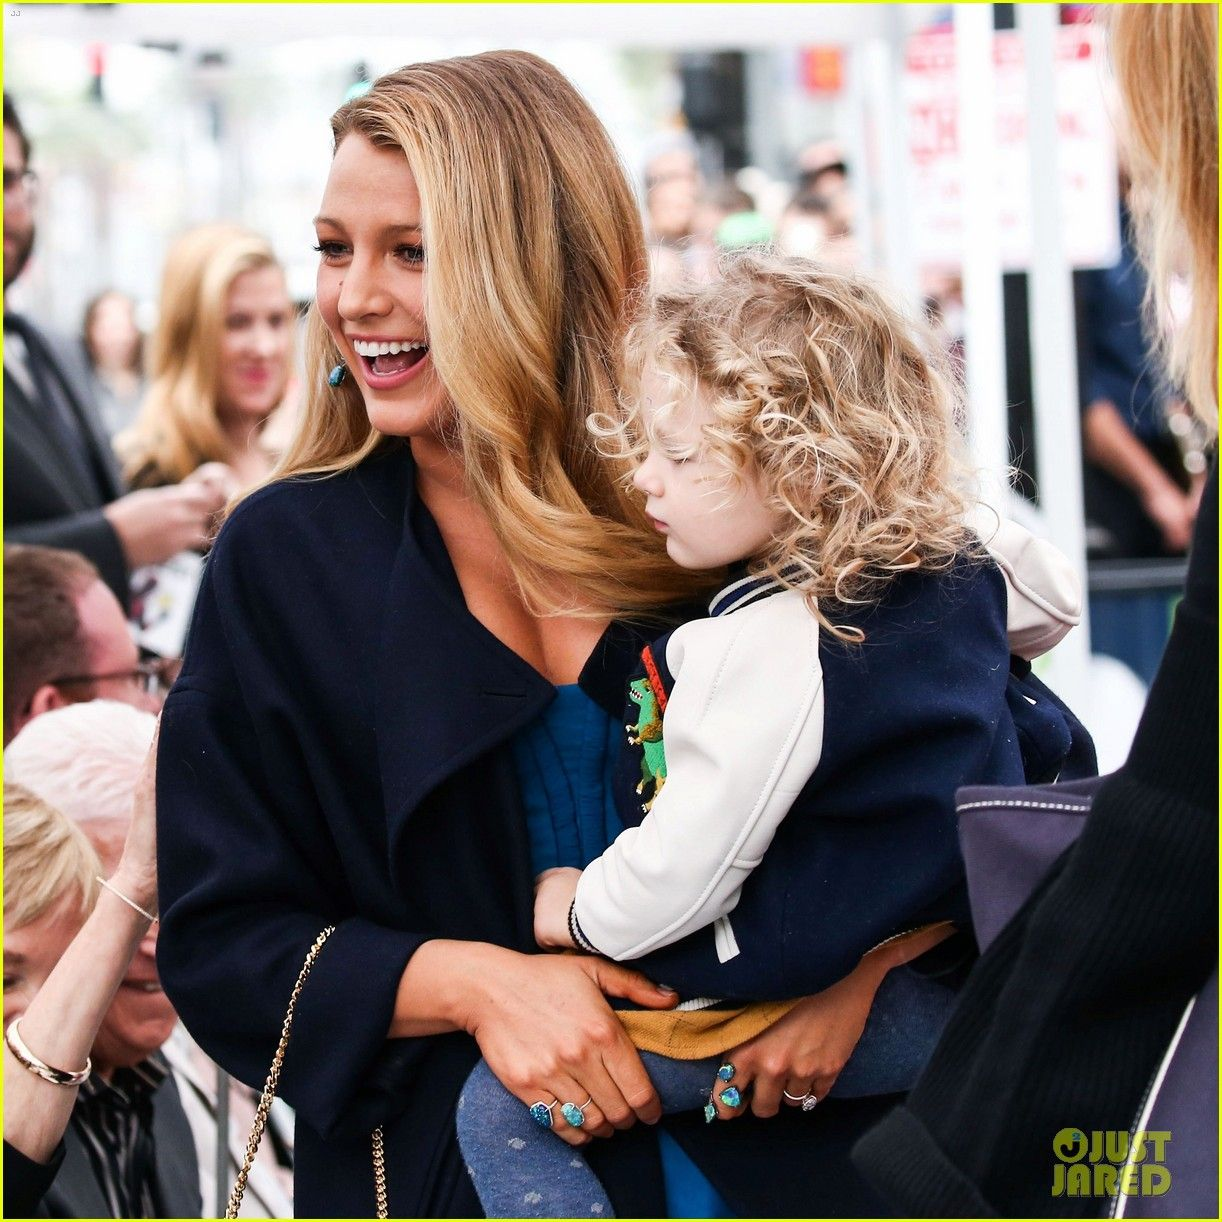 Blake Lively & Ryan Reynolds Newborn Daughter's Name